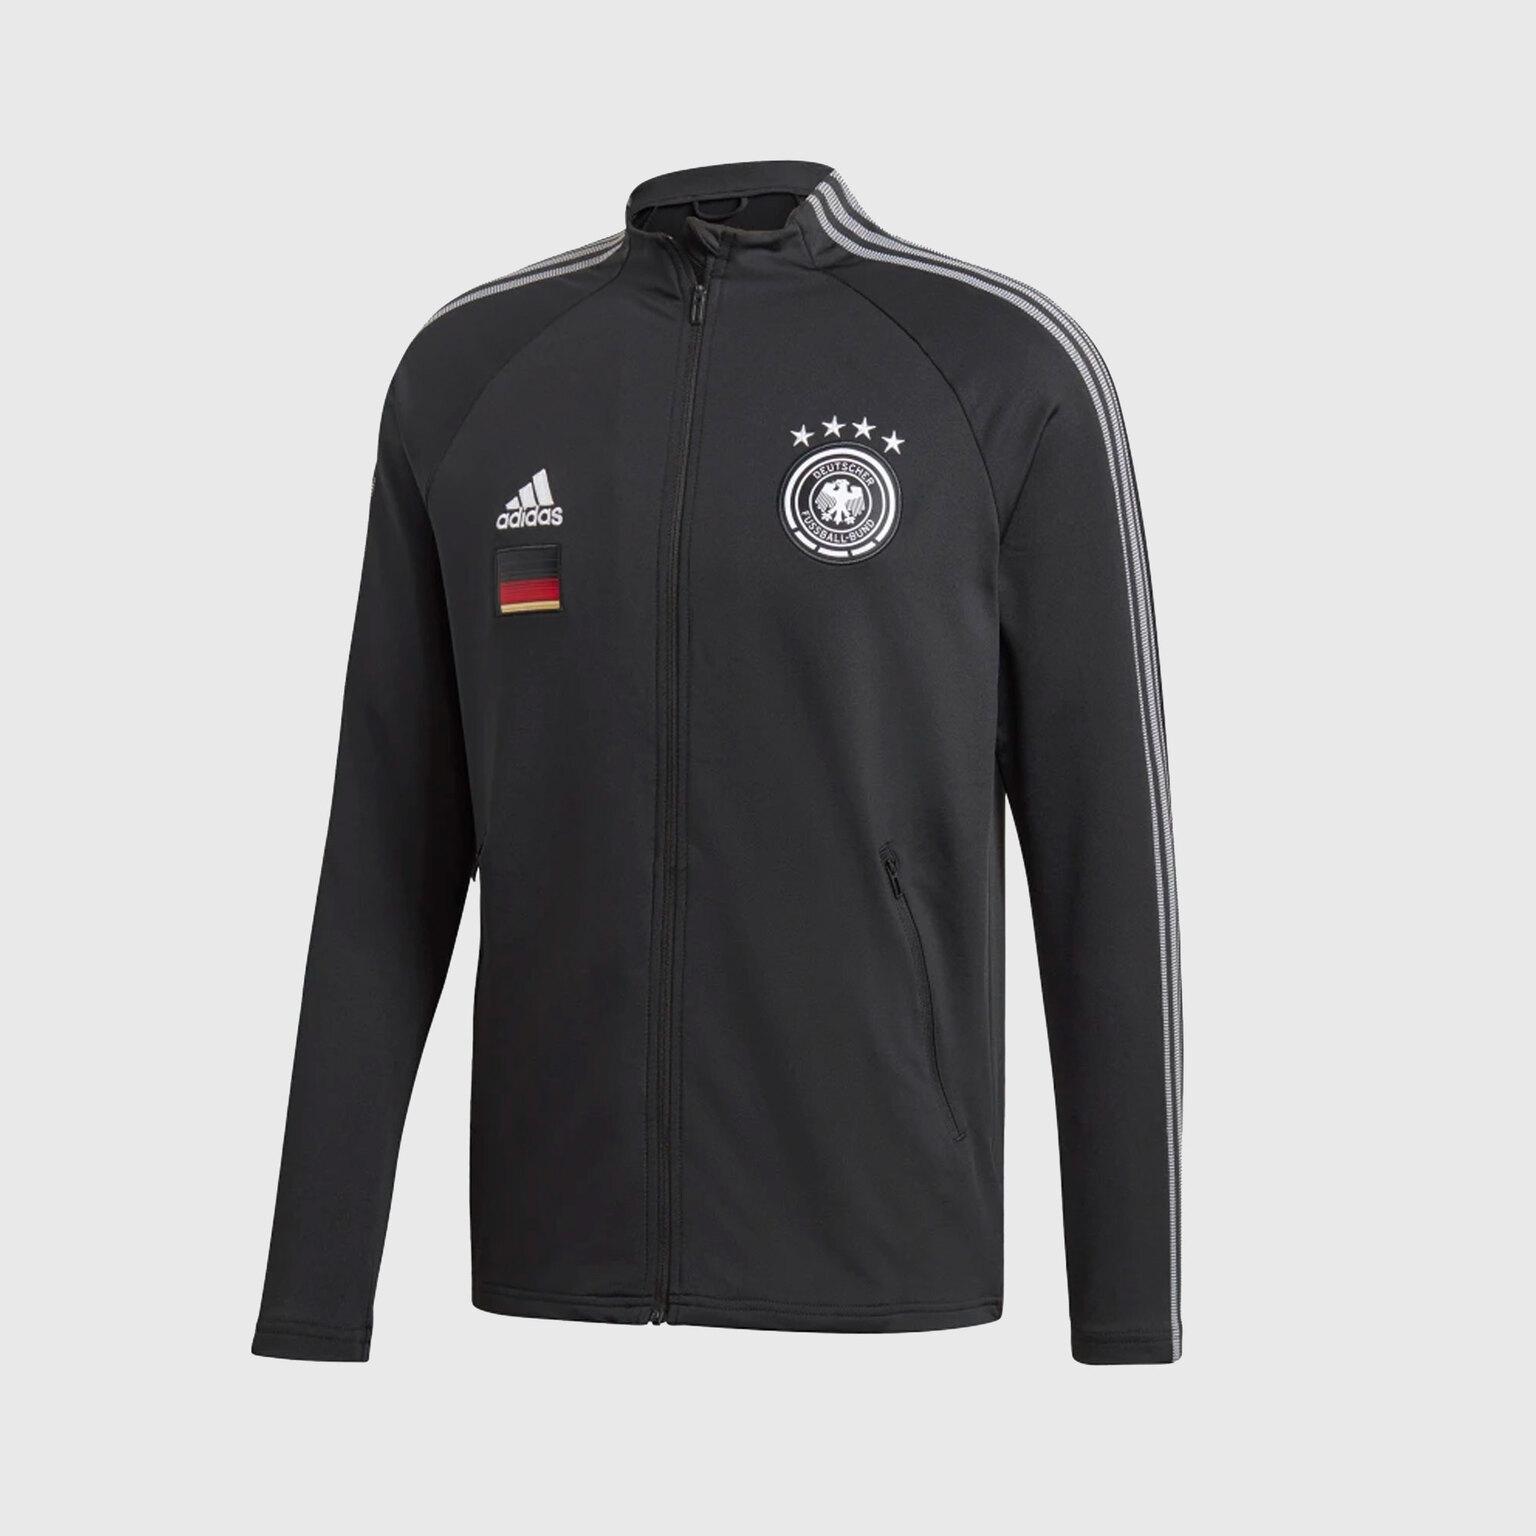 Олимпийка Adidas сборной Германии FI1453